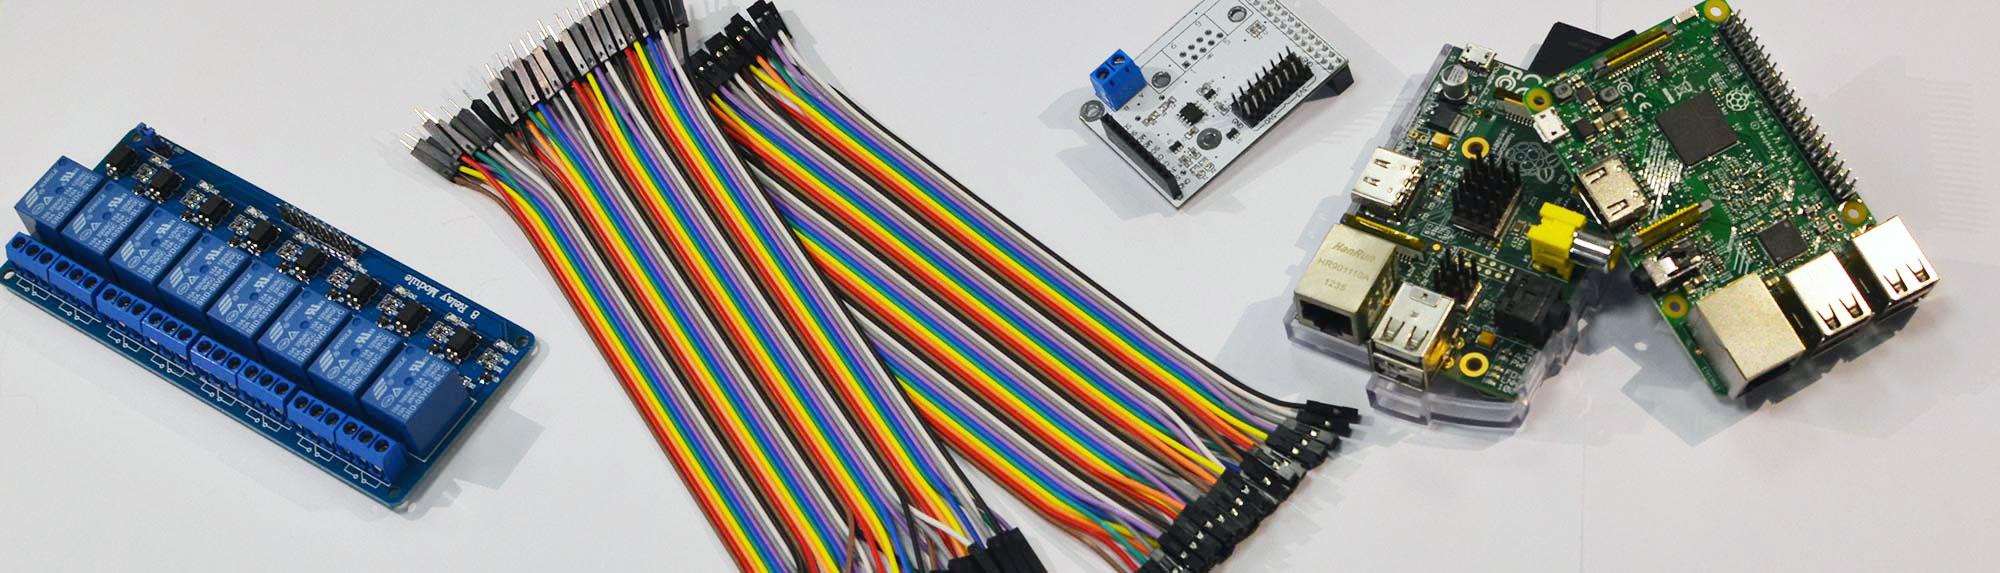 RaspberryPI Arduino alessandria milano torino genova